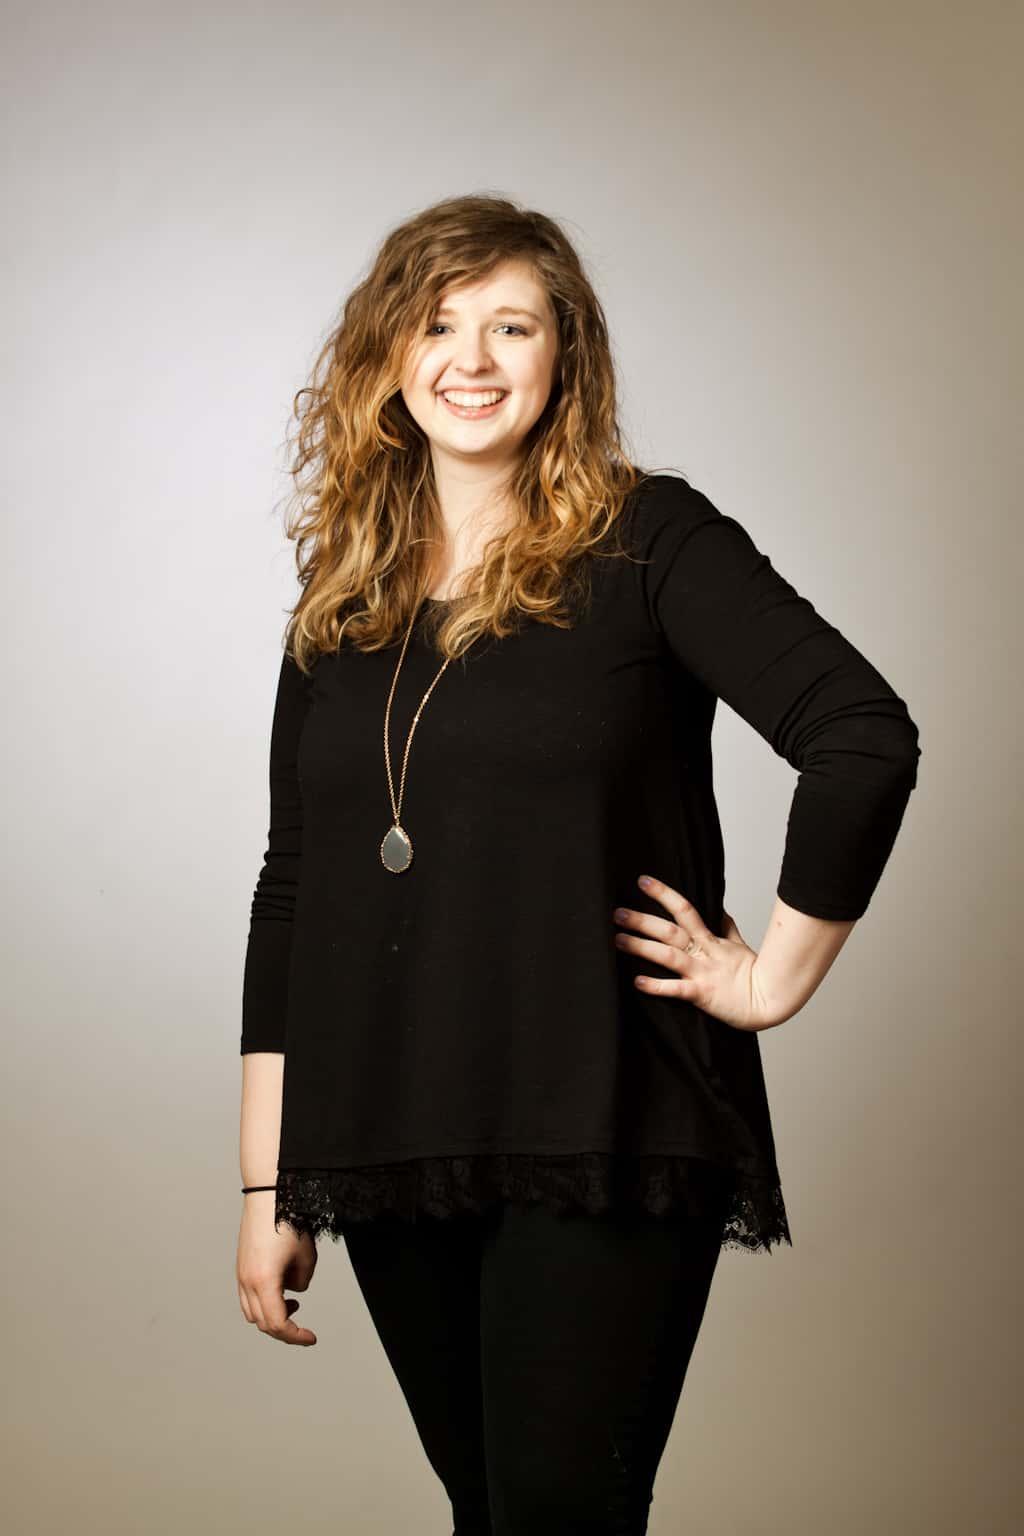 Allison Kay